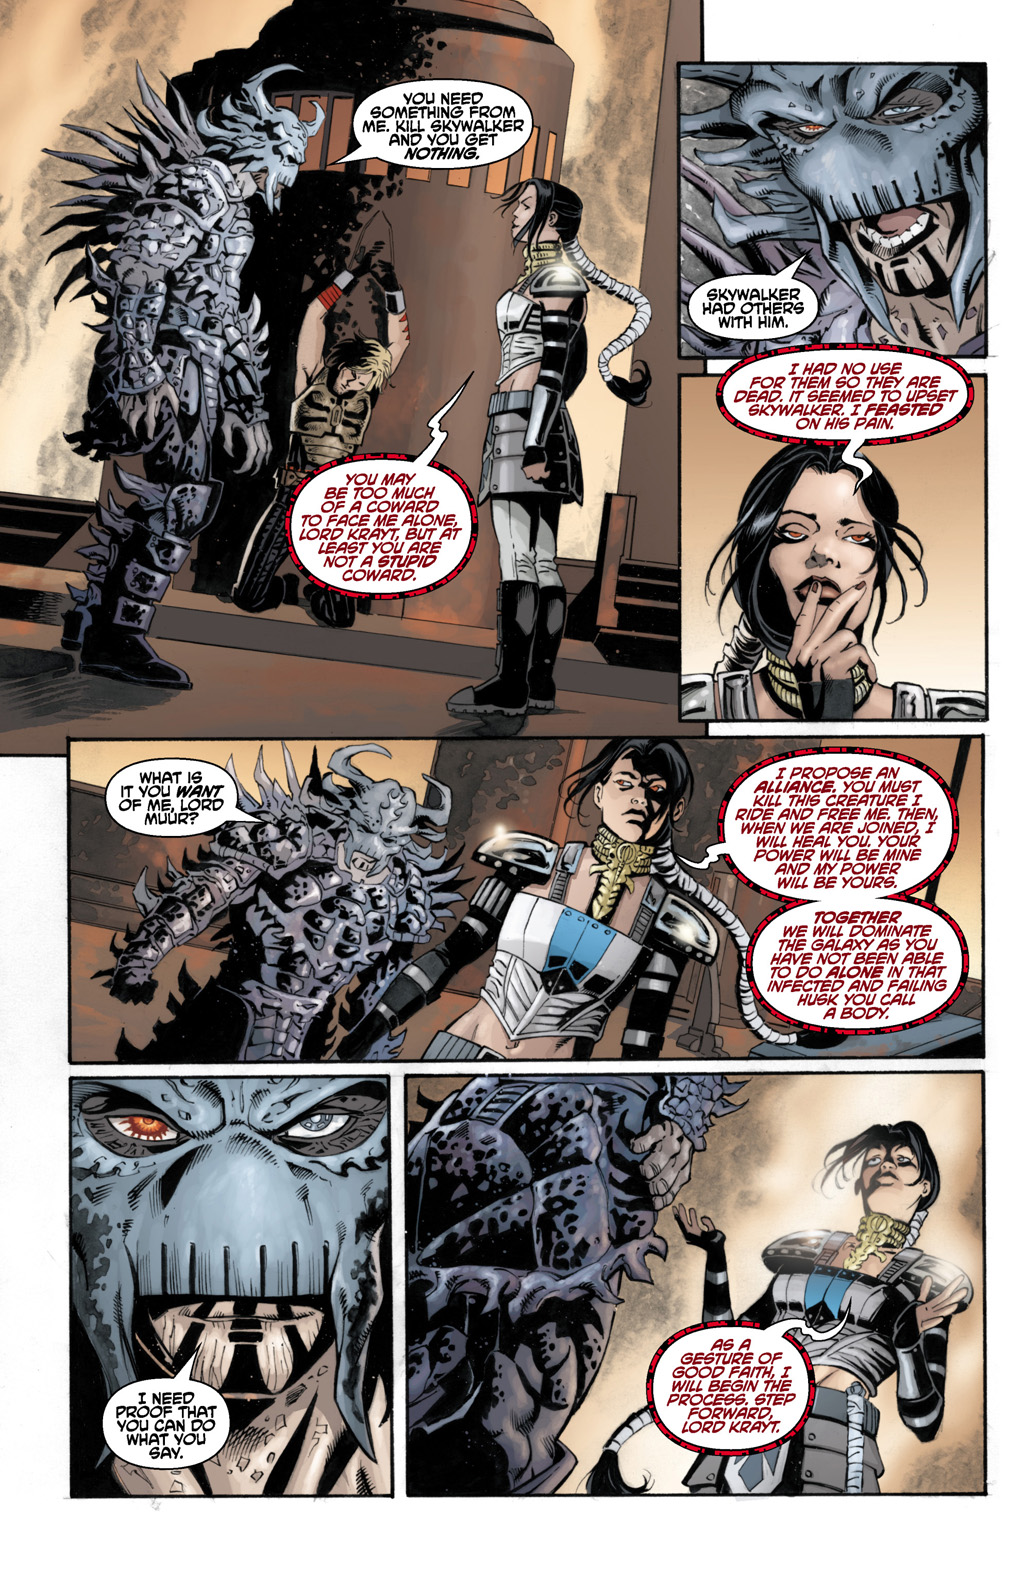 Comic-Only Fights Adapted To Novel Format HIfmzc_i-iwqCVSLEn7IAIpaqMBaN8NEArzyUgA1XwBOna3Om5nHW7RUkWVqd8aVNZxgESBS7H0=s1600